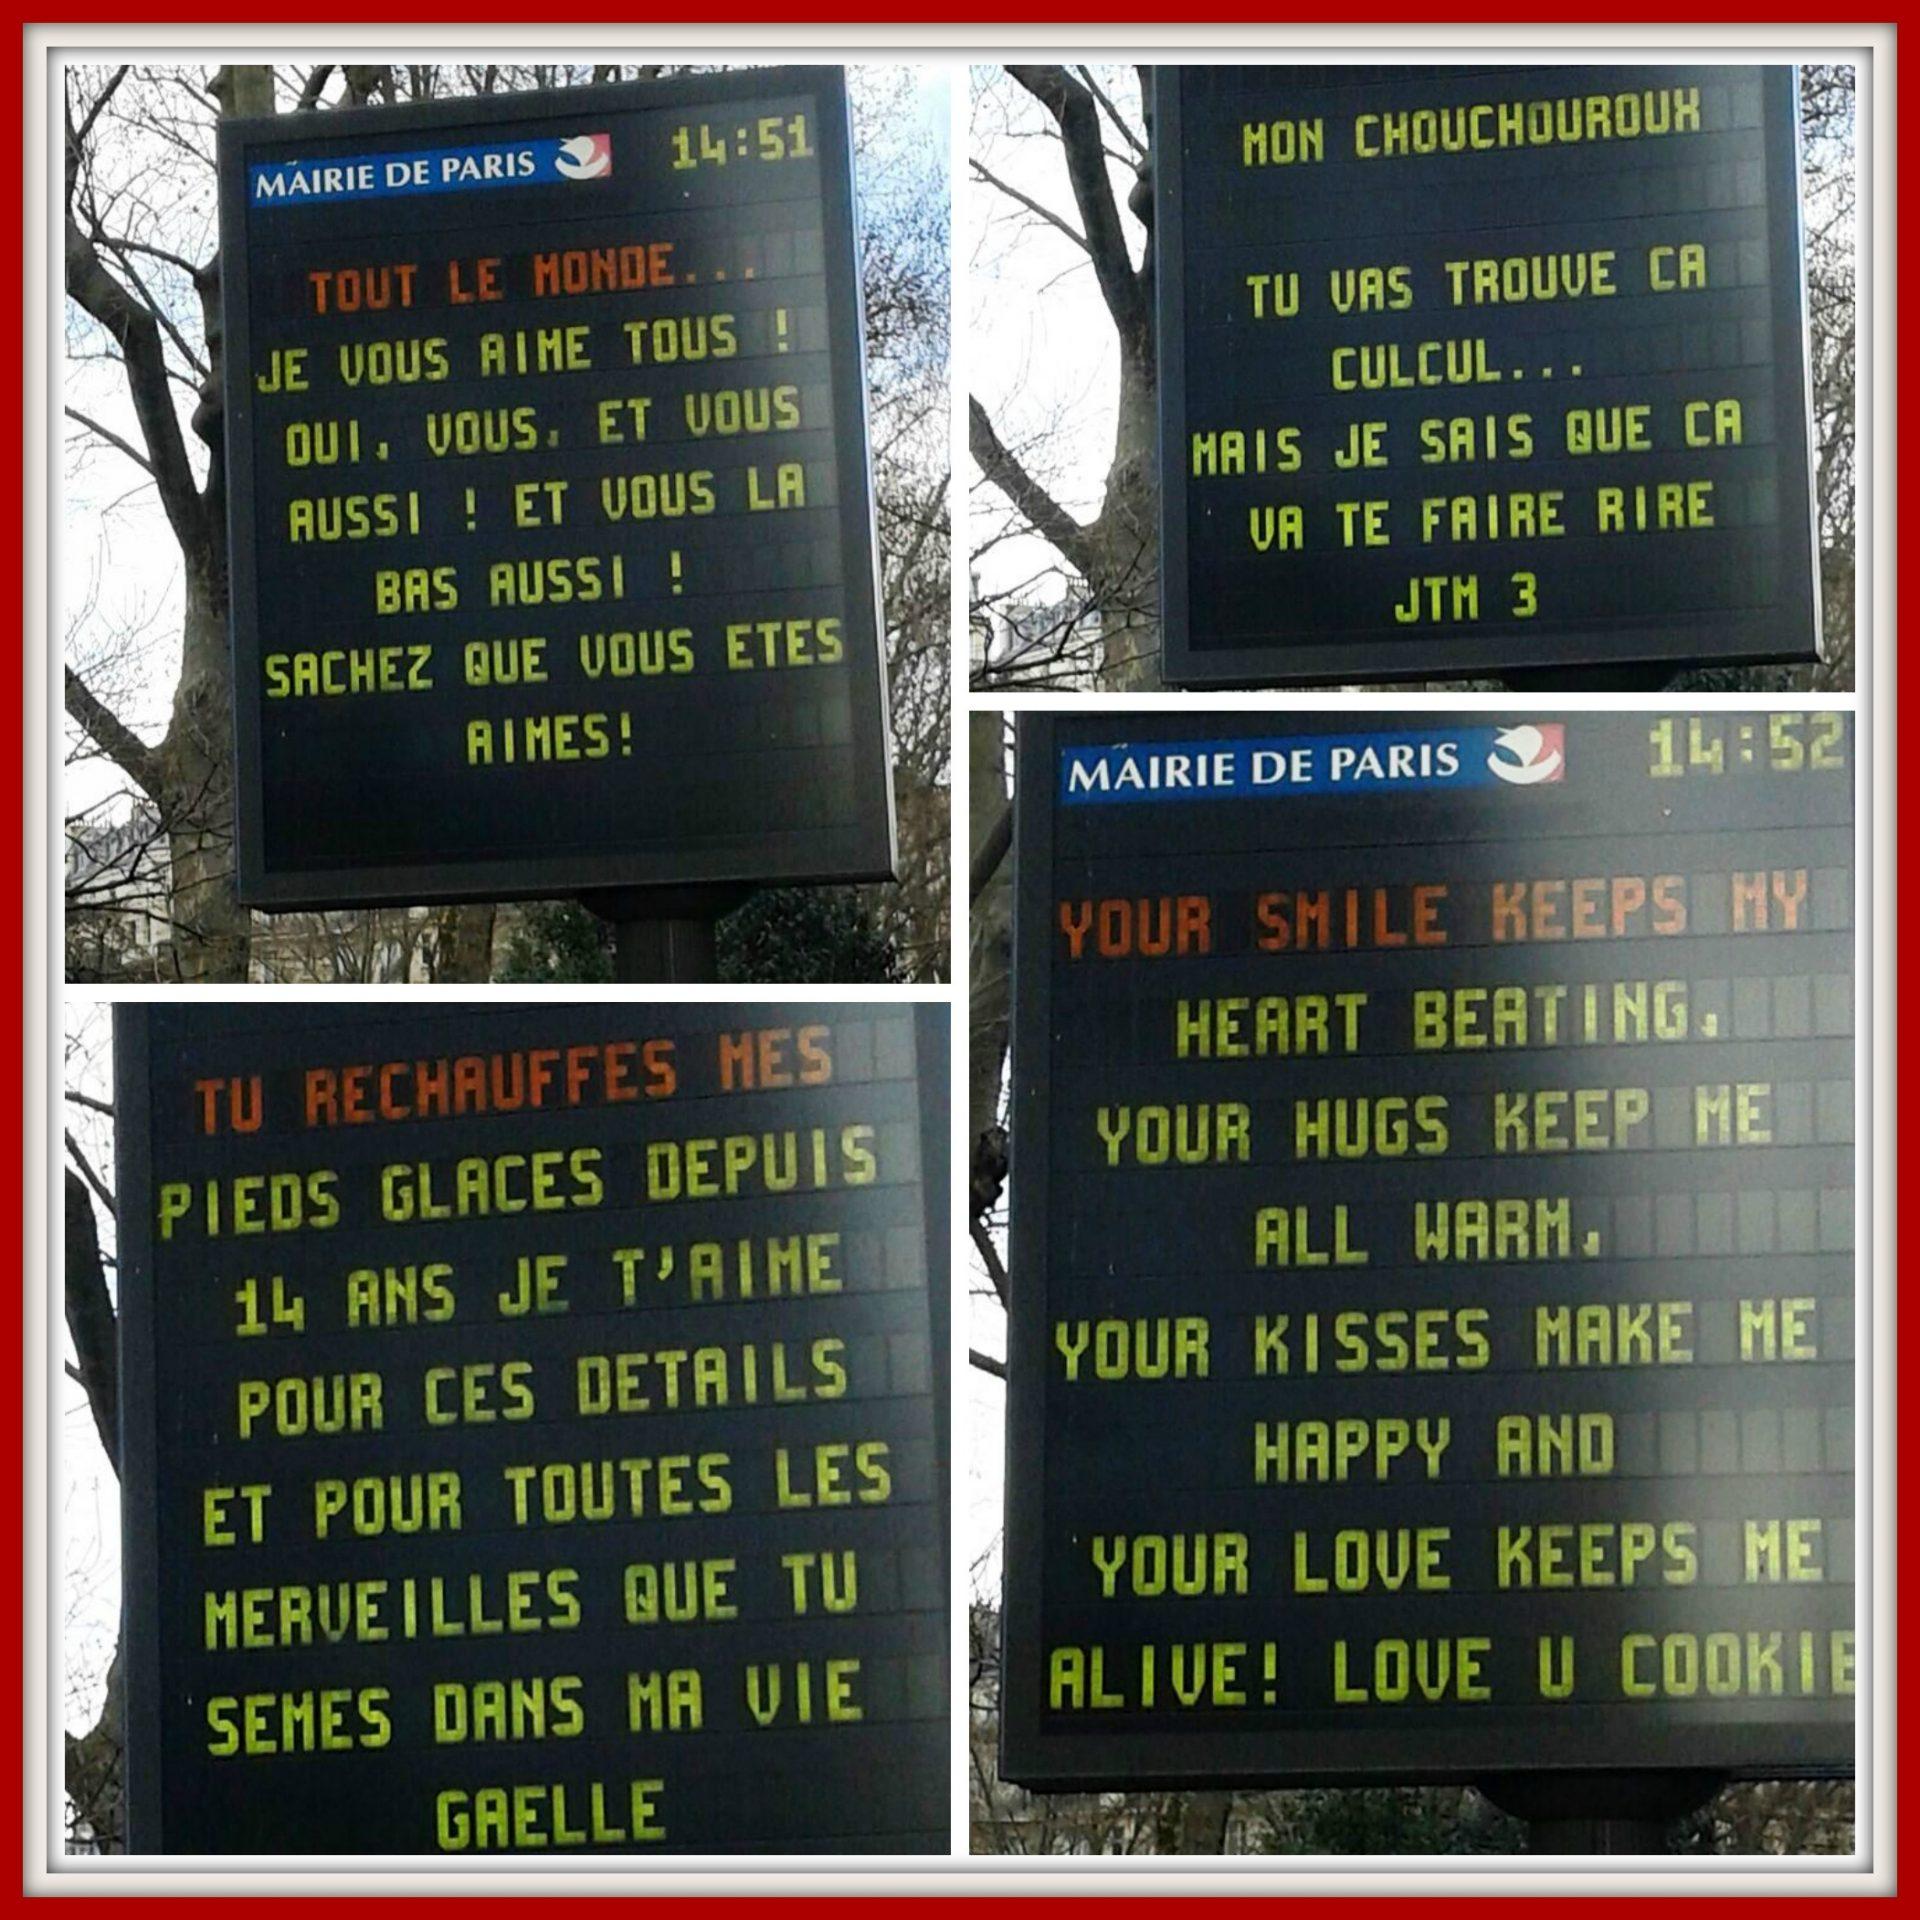 Paris Valentines Day messages